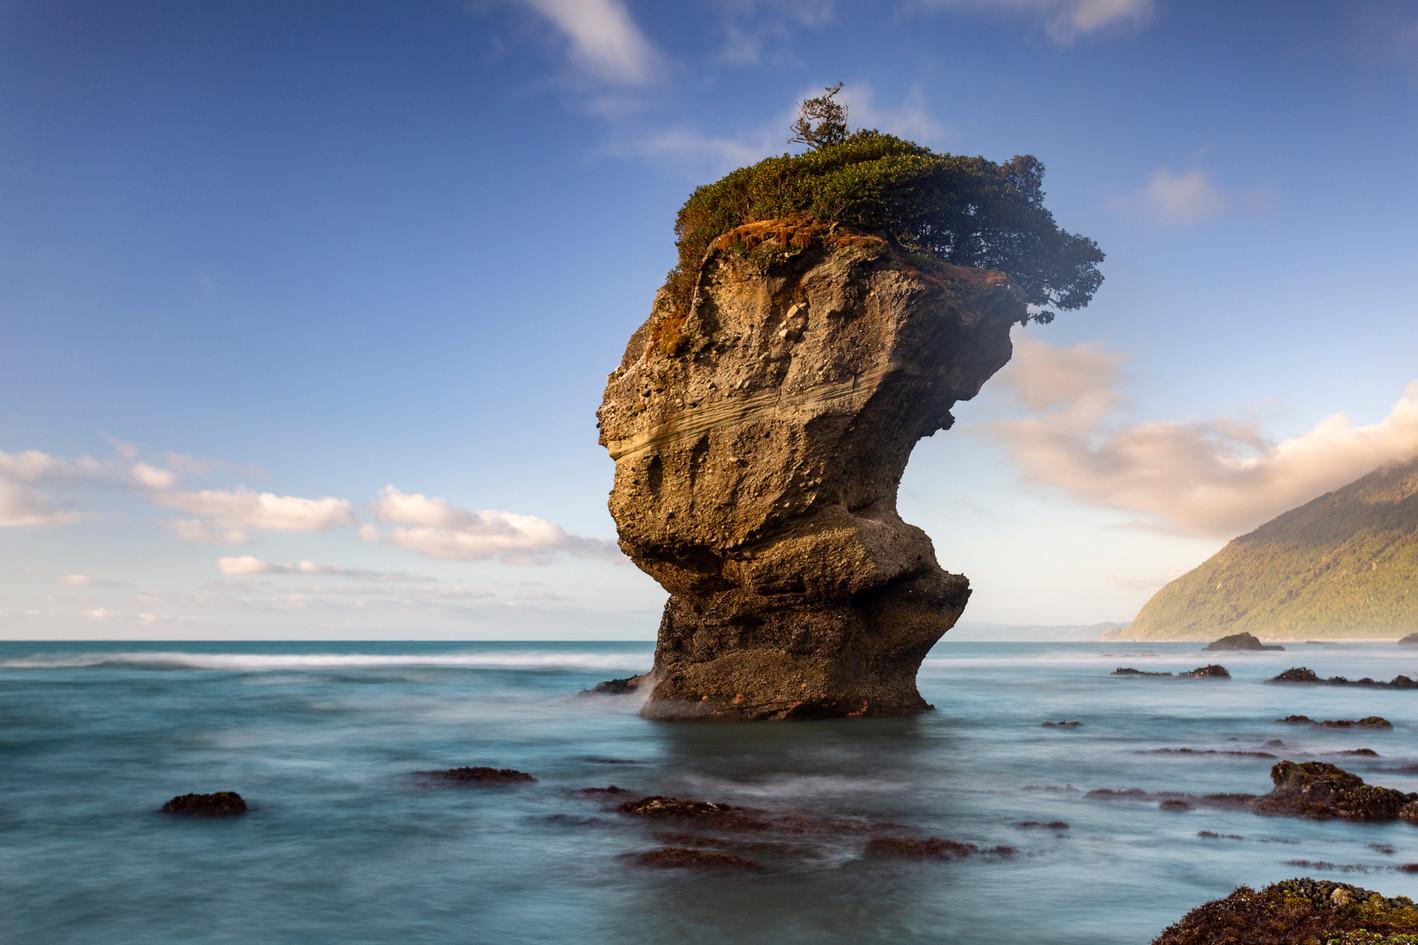 Maori Head Rock Motukiekie, West Coast